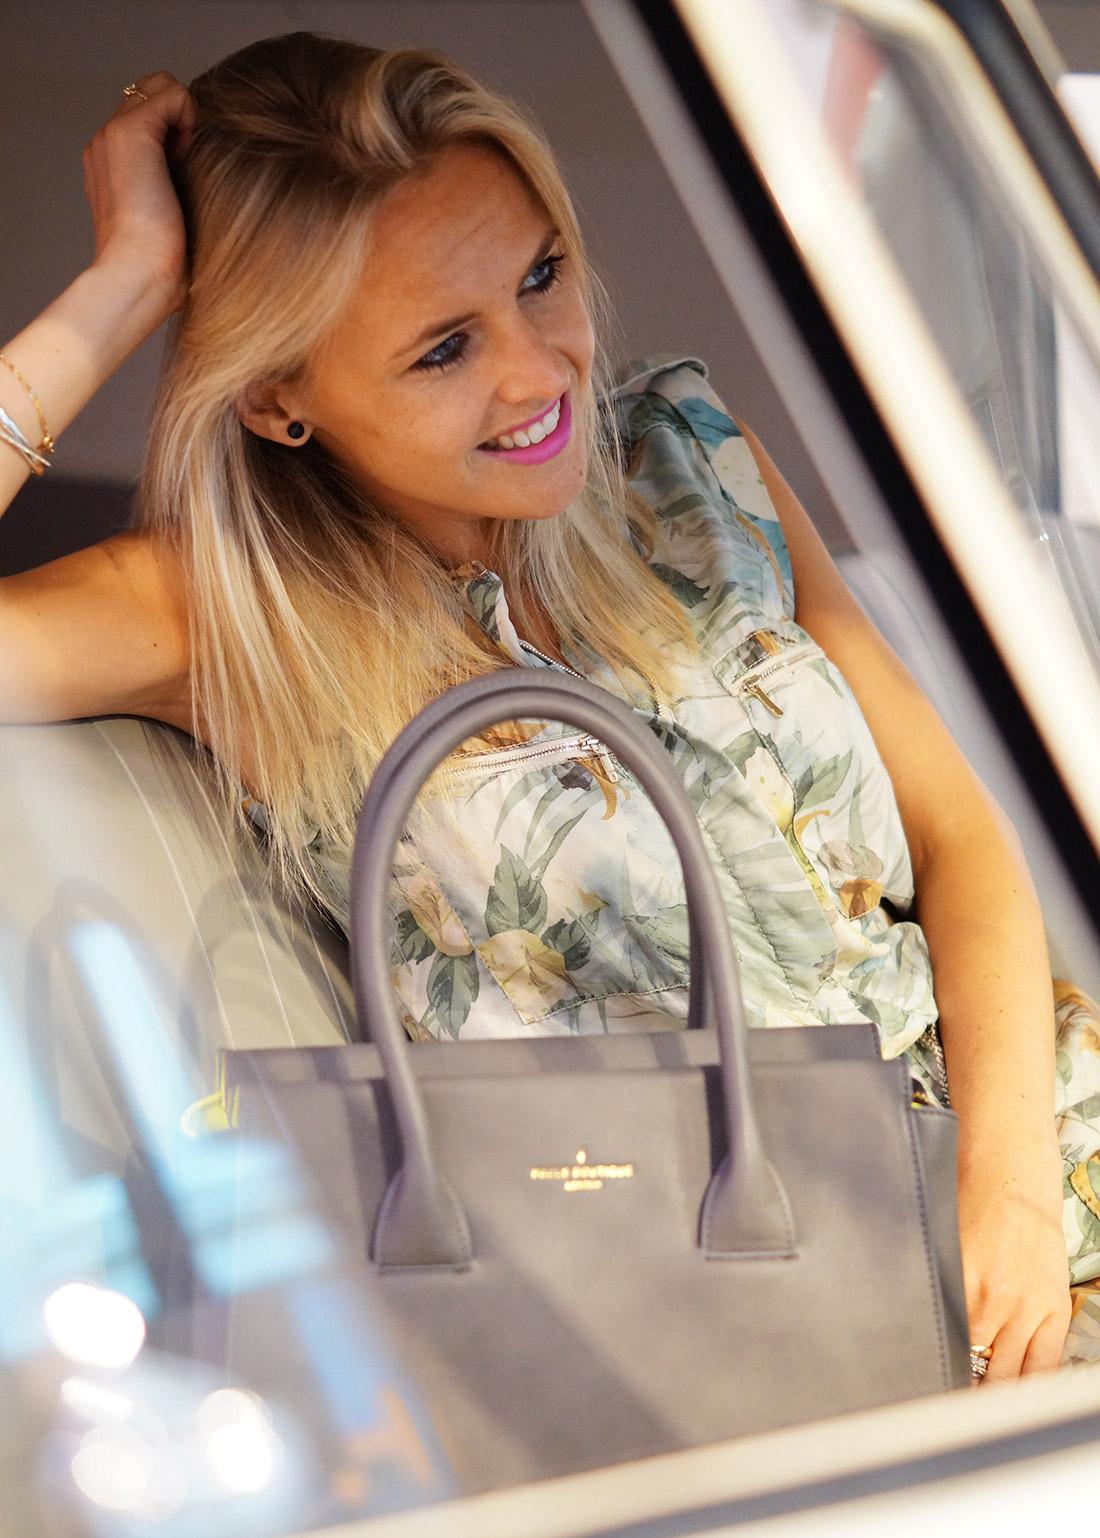 Bag-at-you---Fashion-blog---Last-days-of-summer---Paul's-Boutique-handbag-grey---Limited-edition